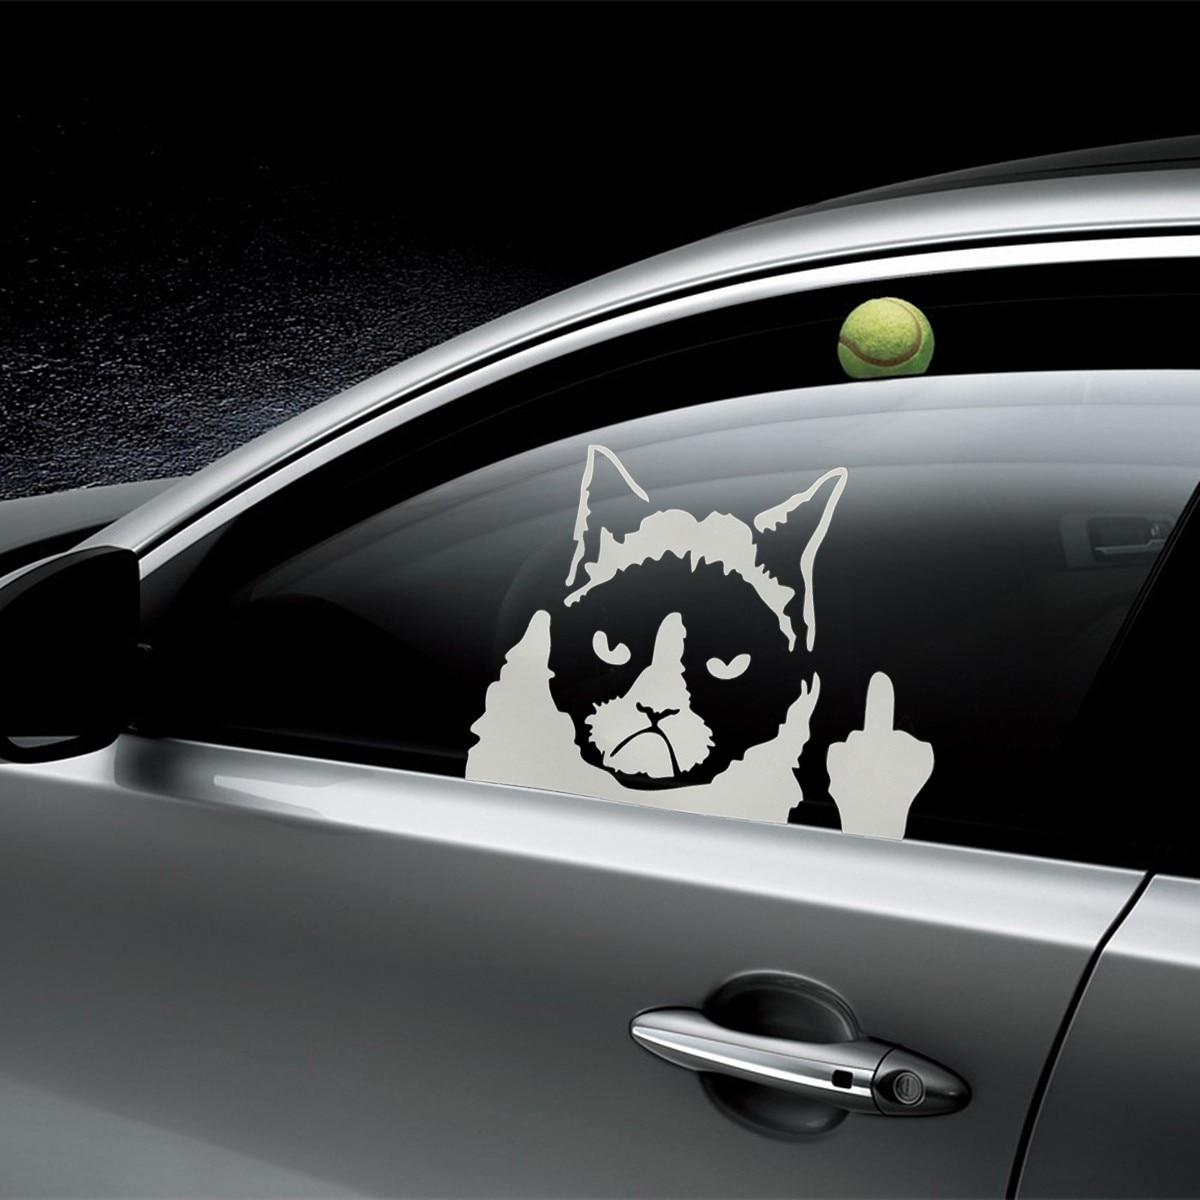 Car bumper sticker designs - Wholesale Cheap Personalized Vinyl Removable 3d Wall Sticker Funny Grumpy Cat Decor For Auto Car Bumper Window Wall Decal Murals